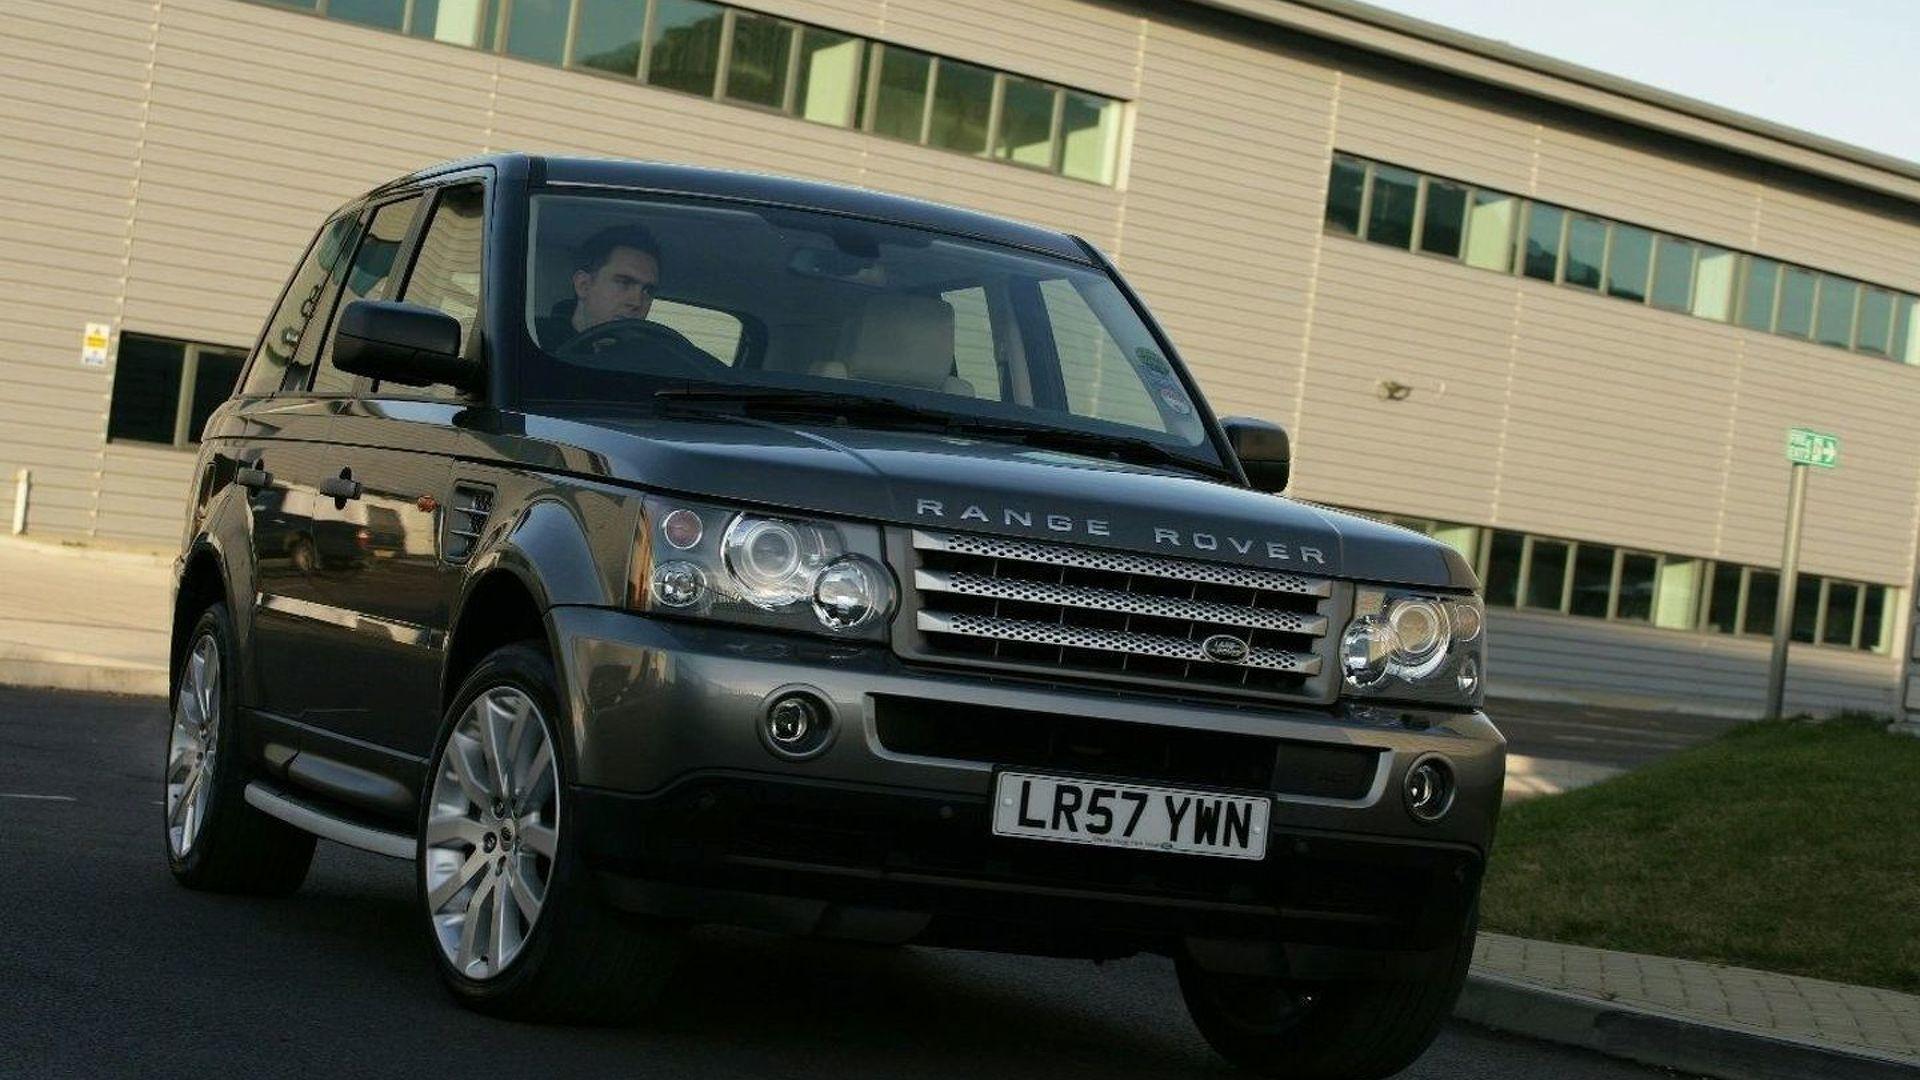 2008 range rover sport supercharged test drive rh motor1 com 2012 Range Rover 2005 Range Rover